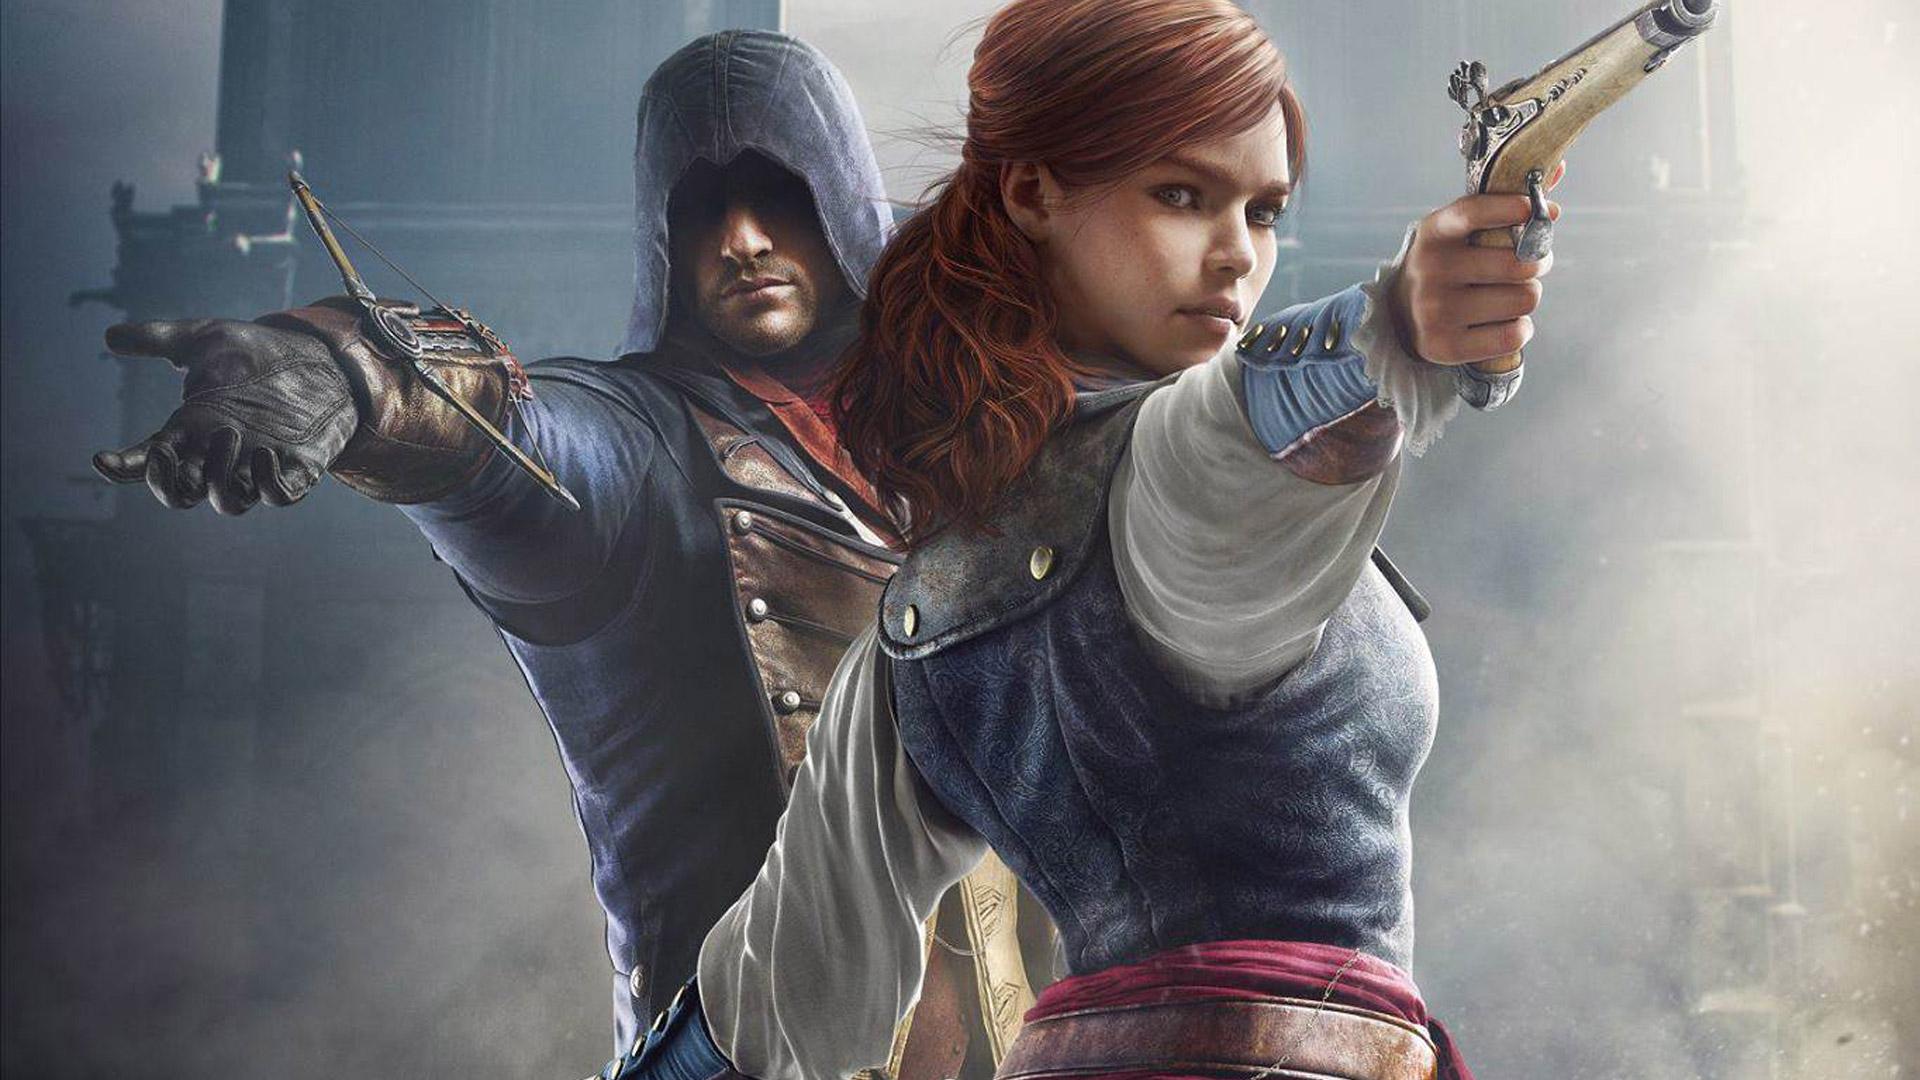 Арт к игре Assassin's Creed: Unity